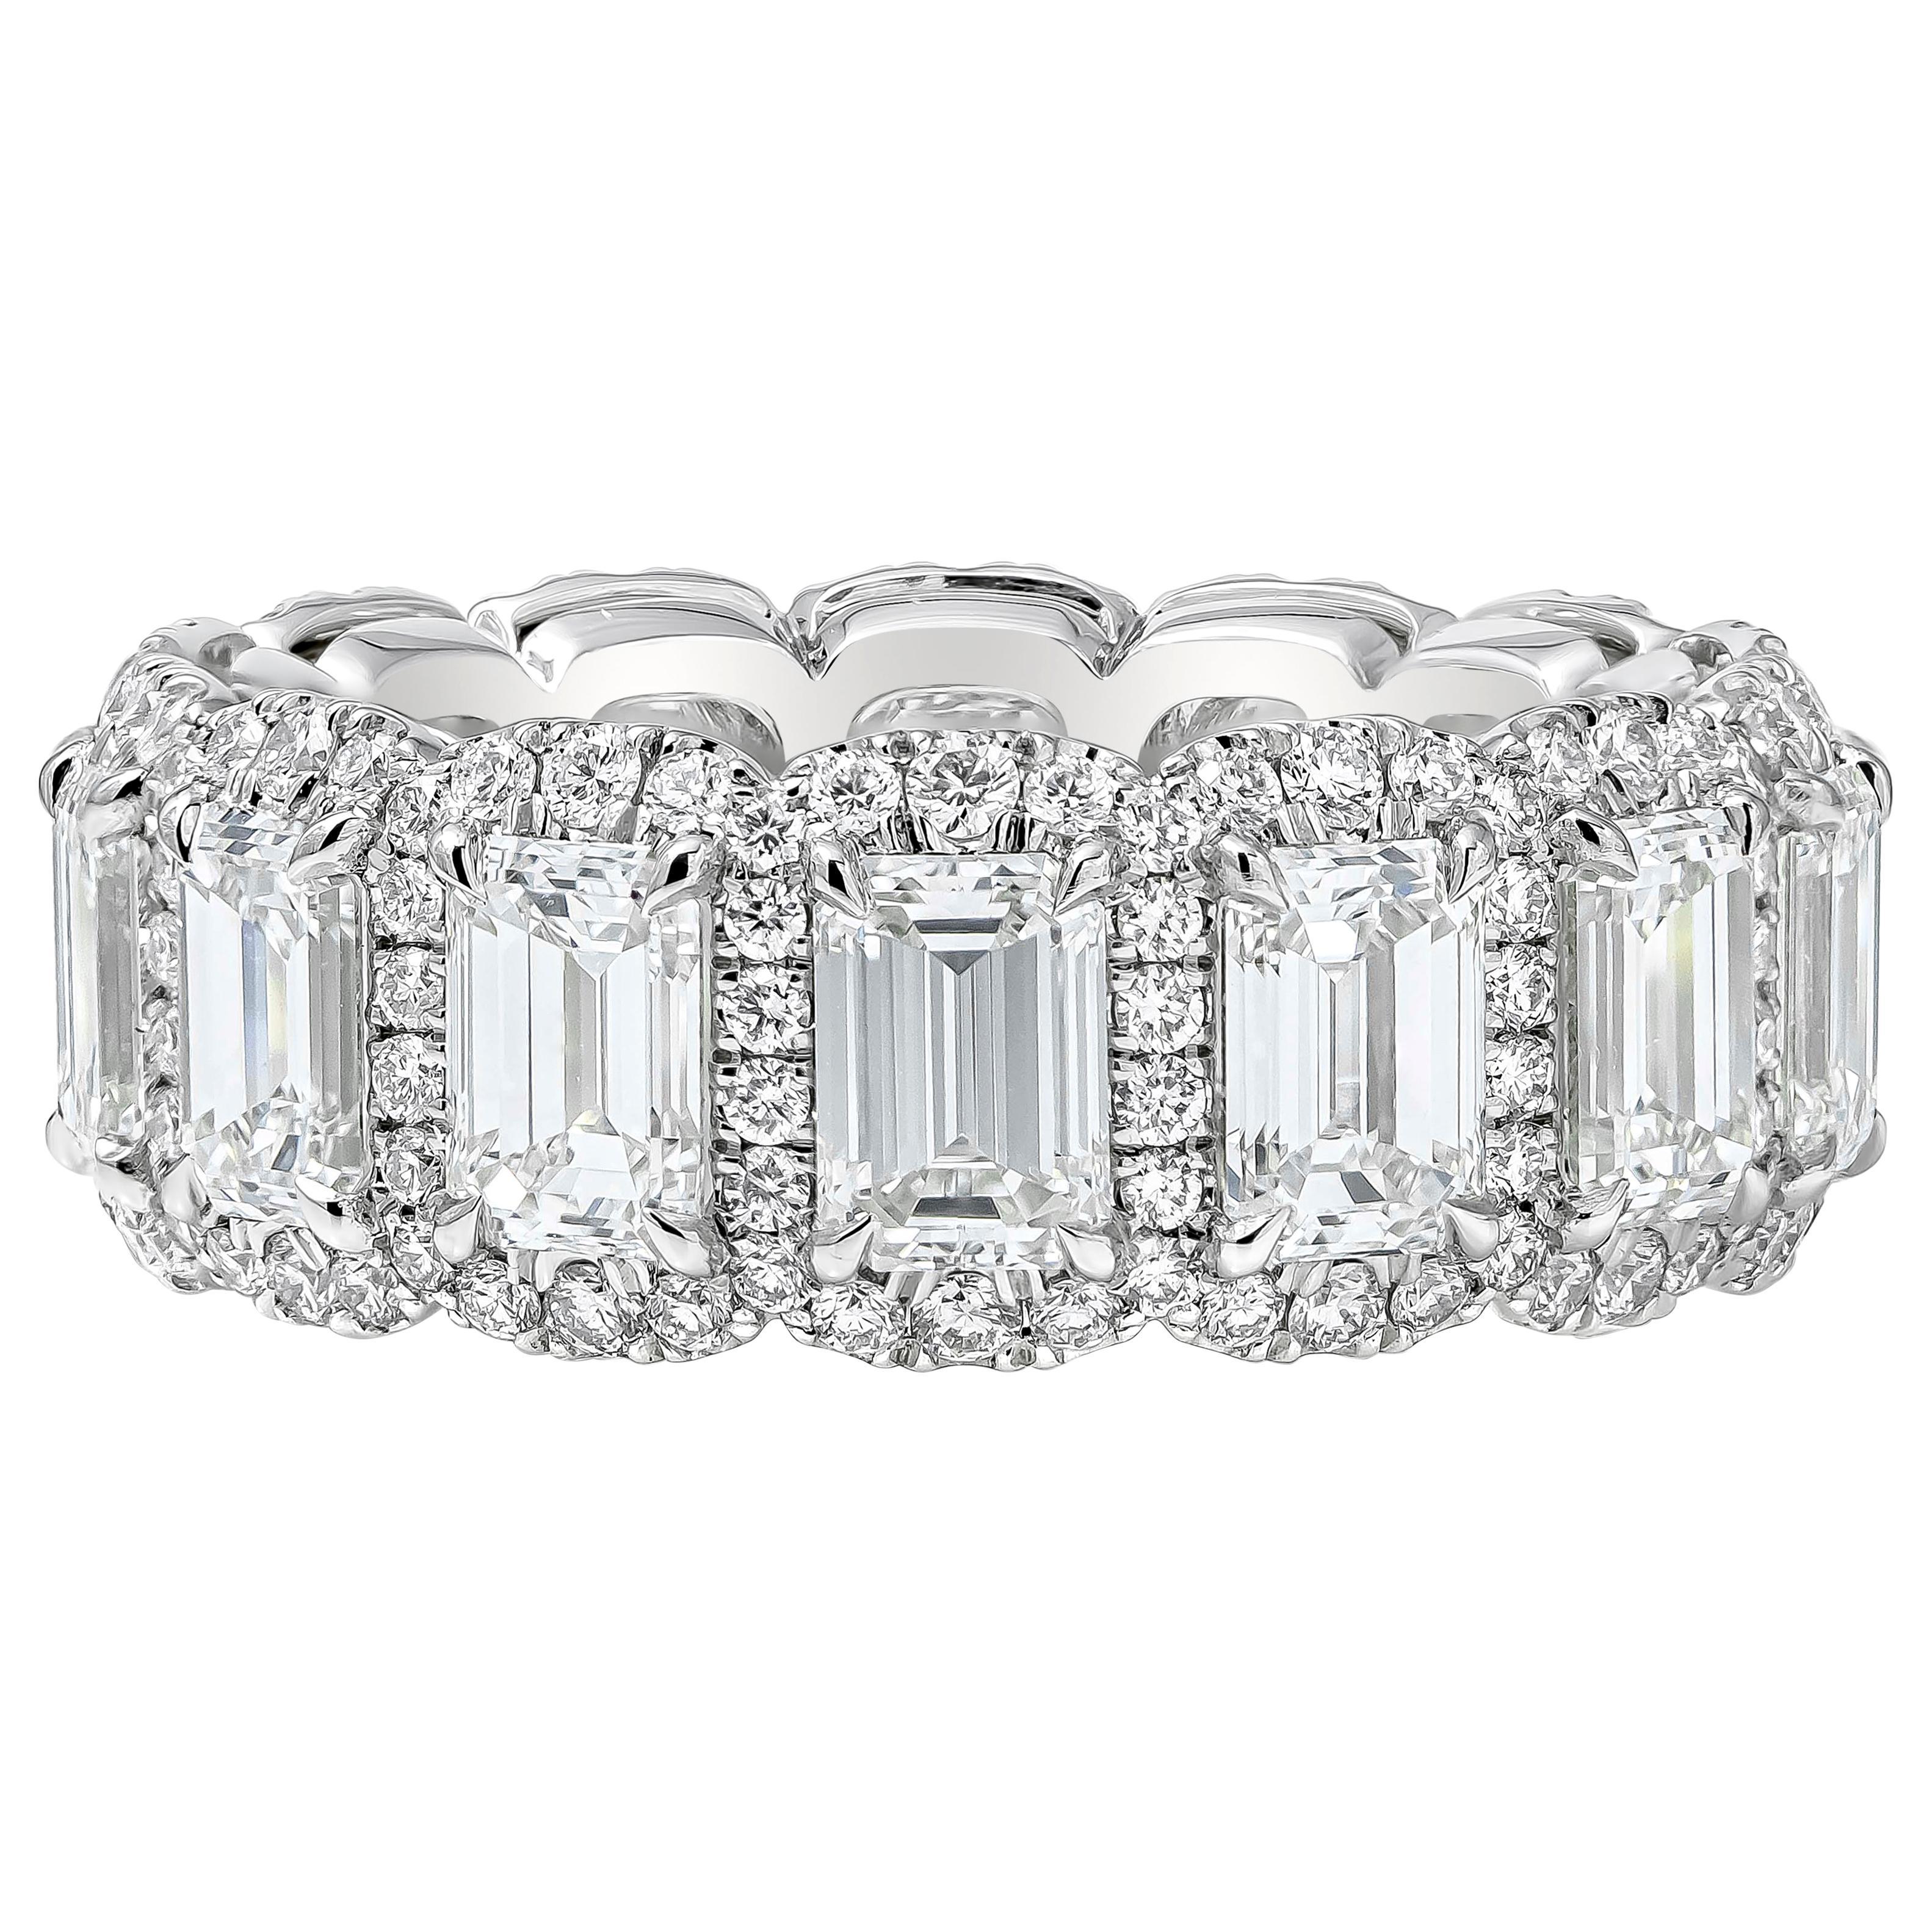 Roman Malakov Emerald Cut Diamond Halo Eternity Wedding Band